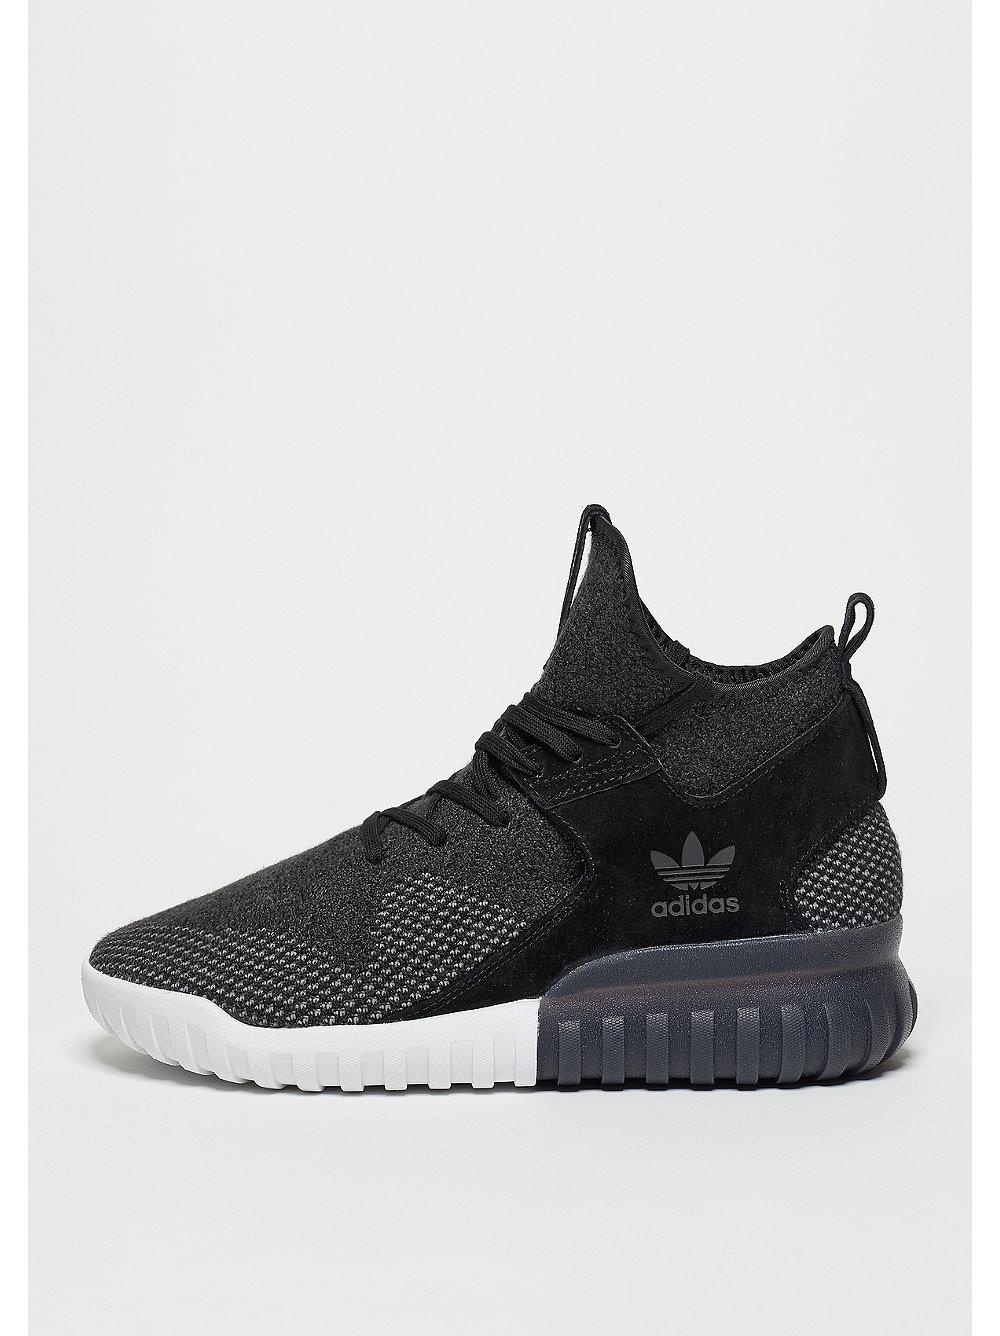 adidas Tubular X PK core black